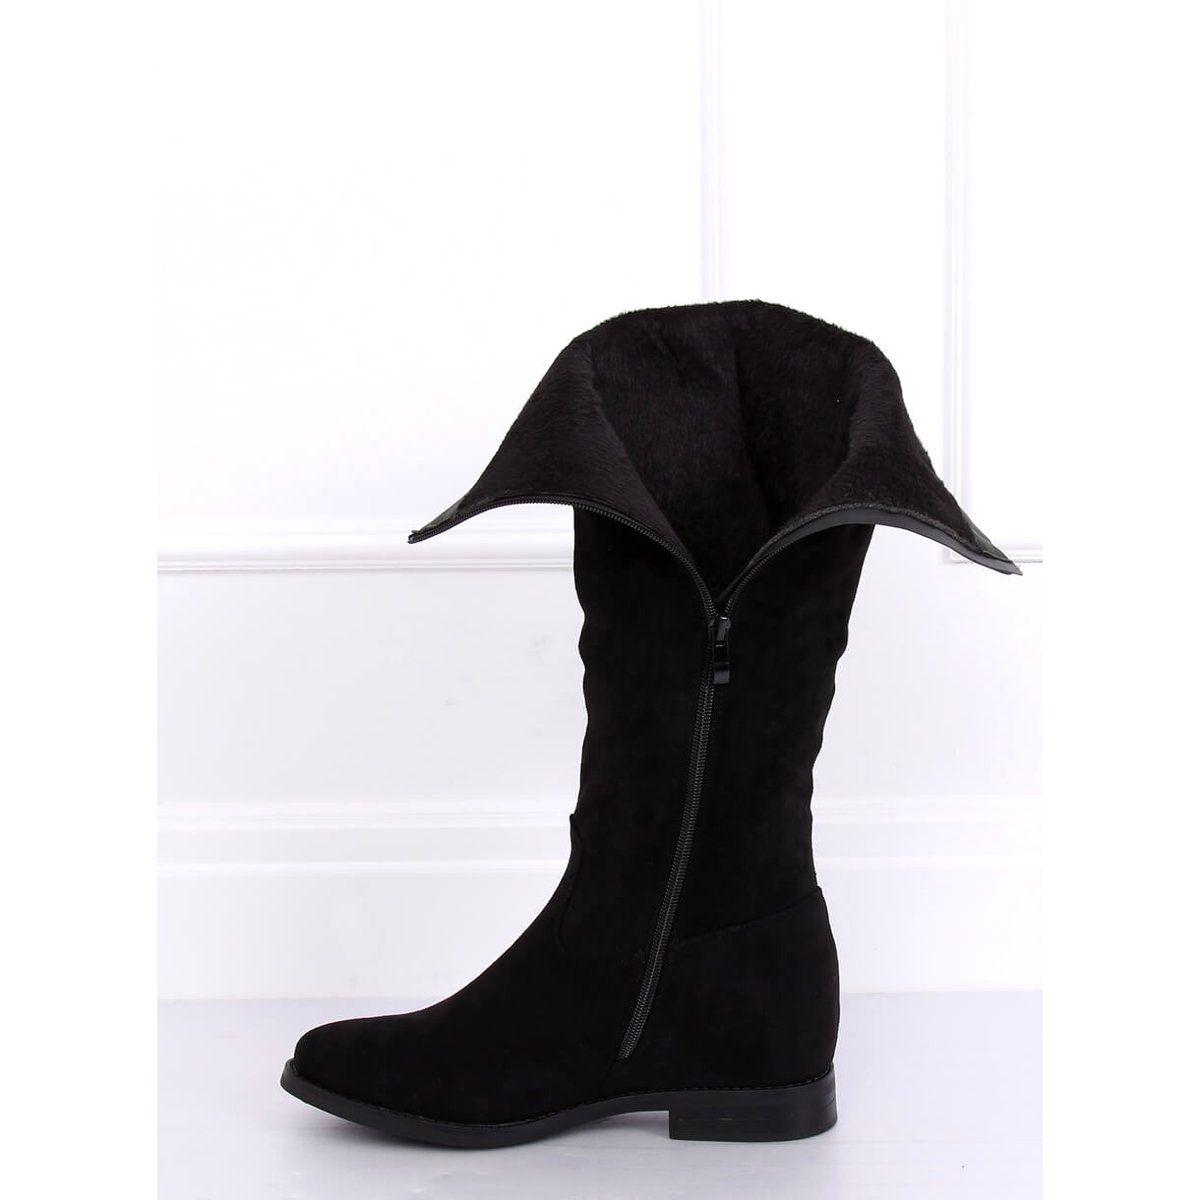 Kozaki Na Ukrytym Koturnie Czarne Nc968p Black Boots Black Boots Fashion Cowboy Boots